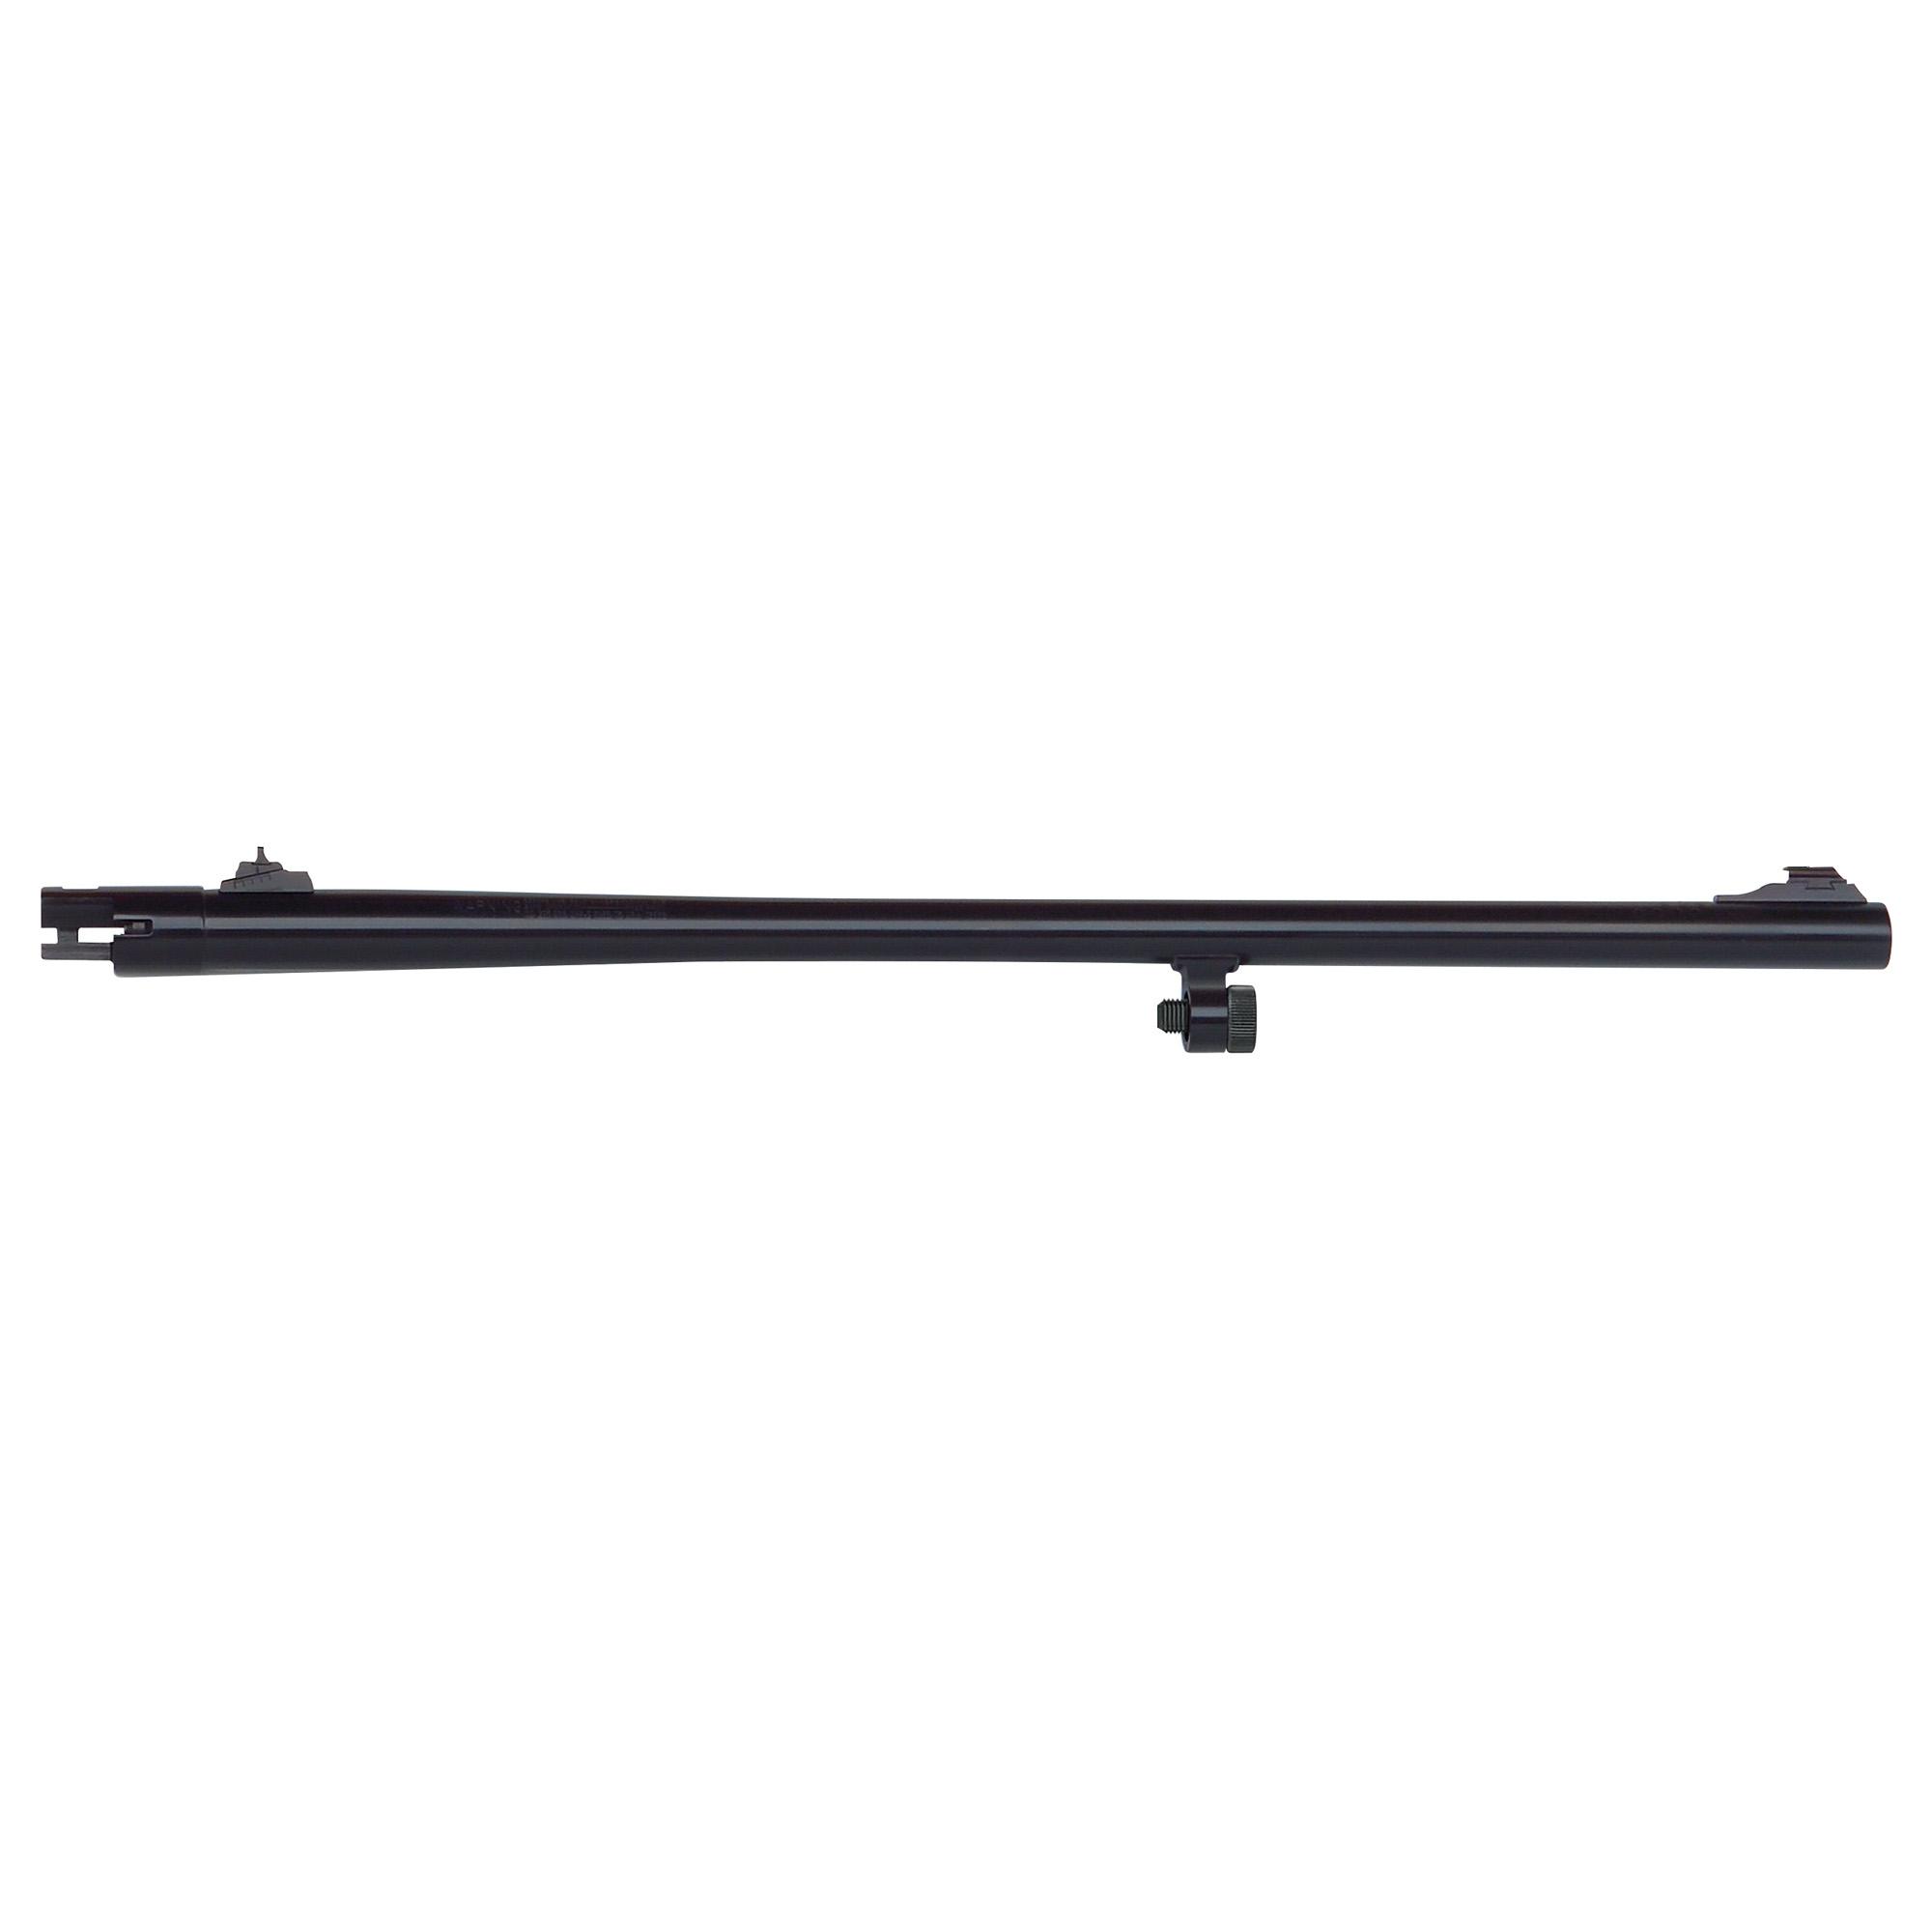 "24"" Slug barrel with adjustable rifle sights"" fully-rifled bore"" and blued finish. Compatible with 12 Gauge Mossberg 500 and Maverick 88 6-shot models."